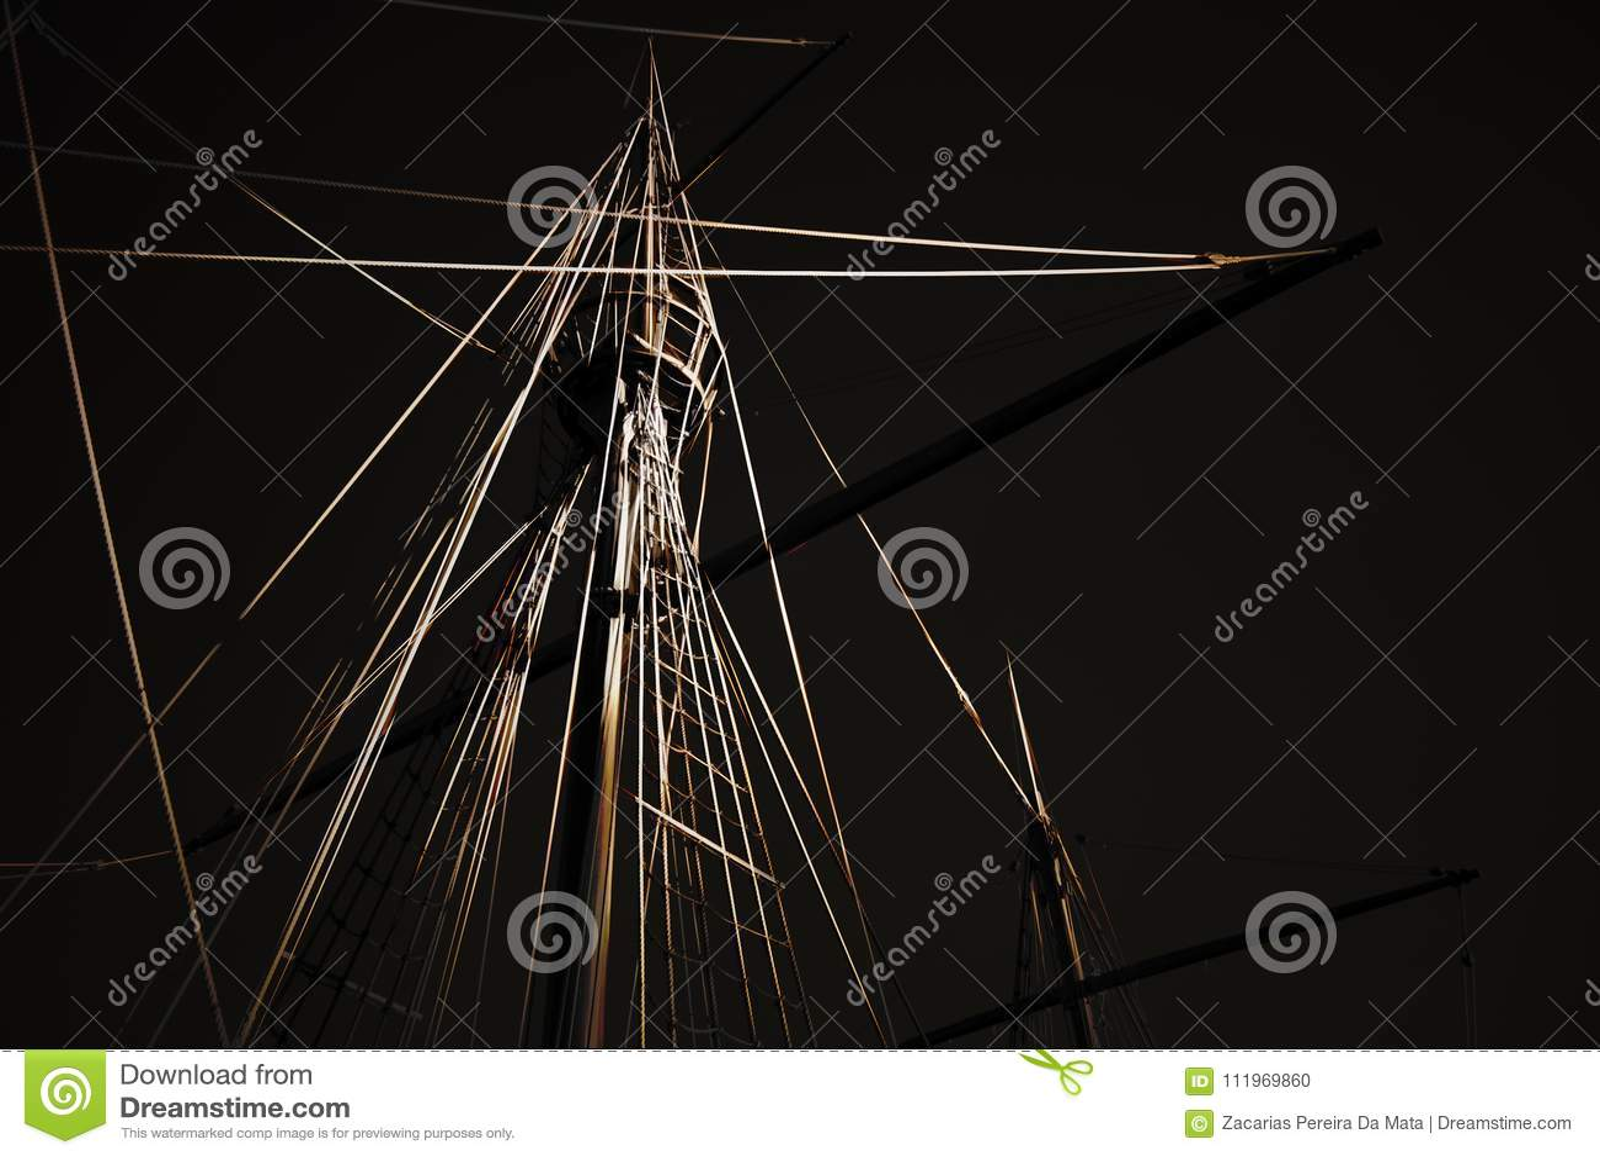 Digital caravel rigging